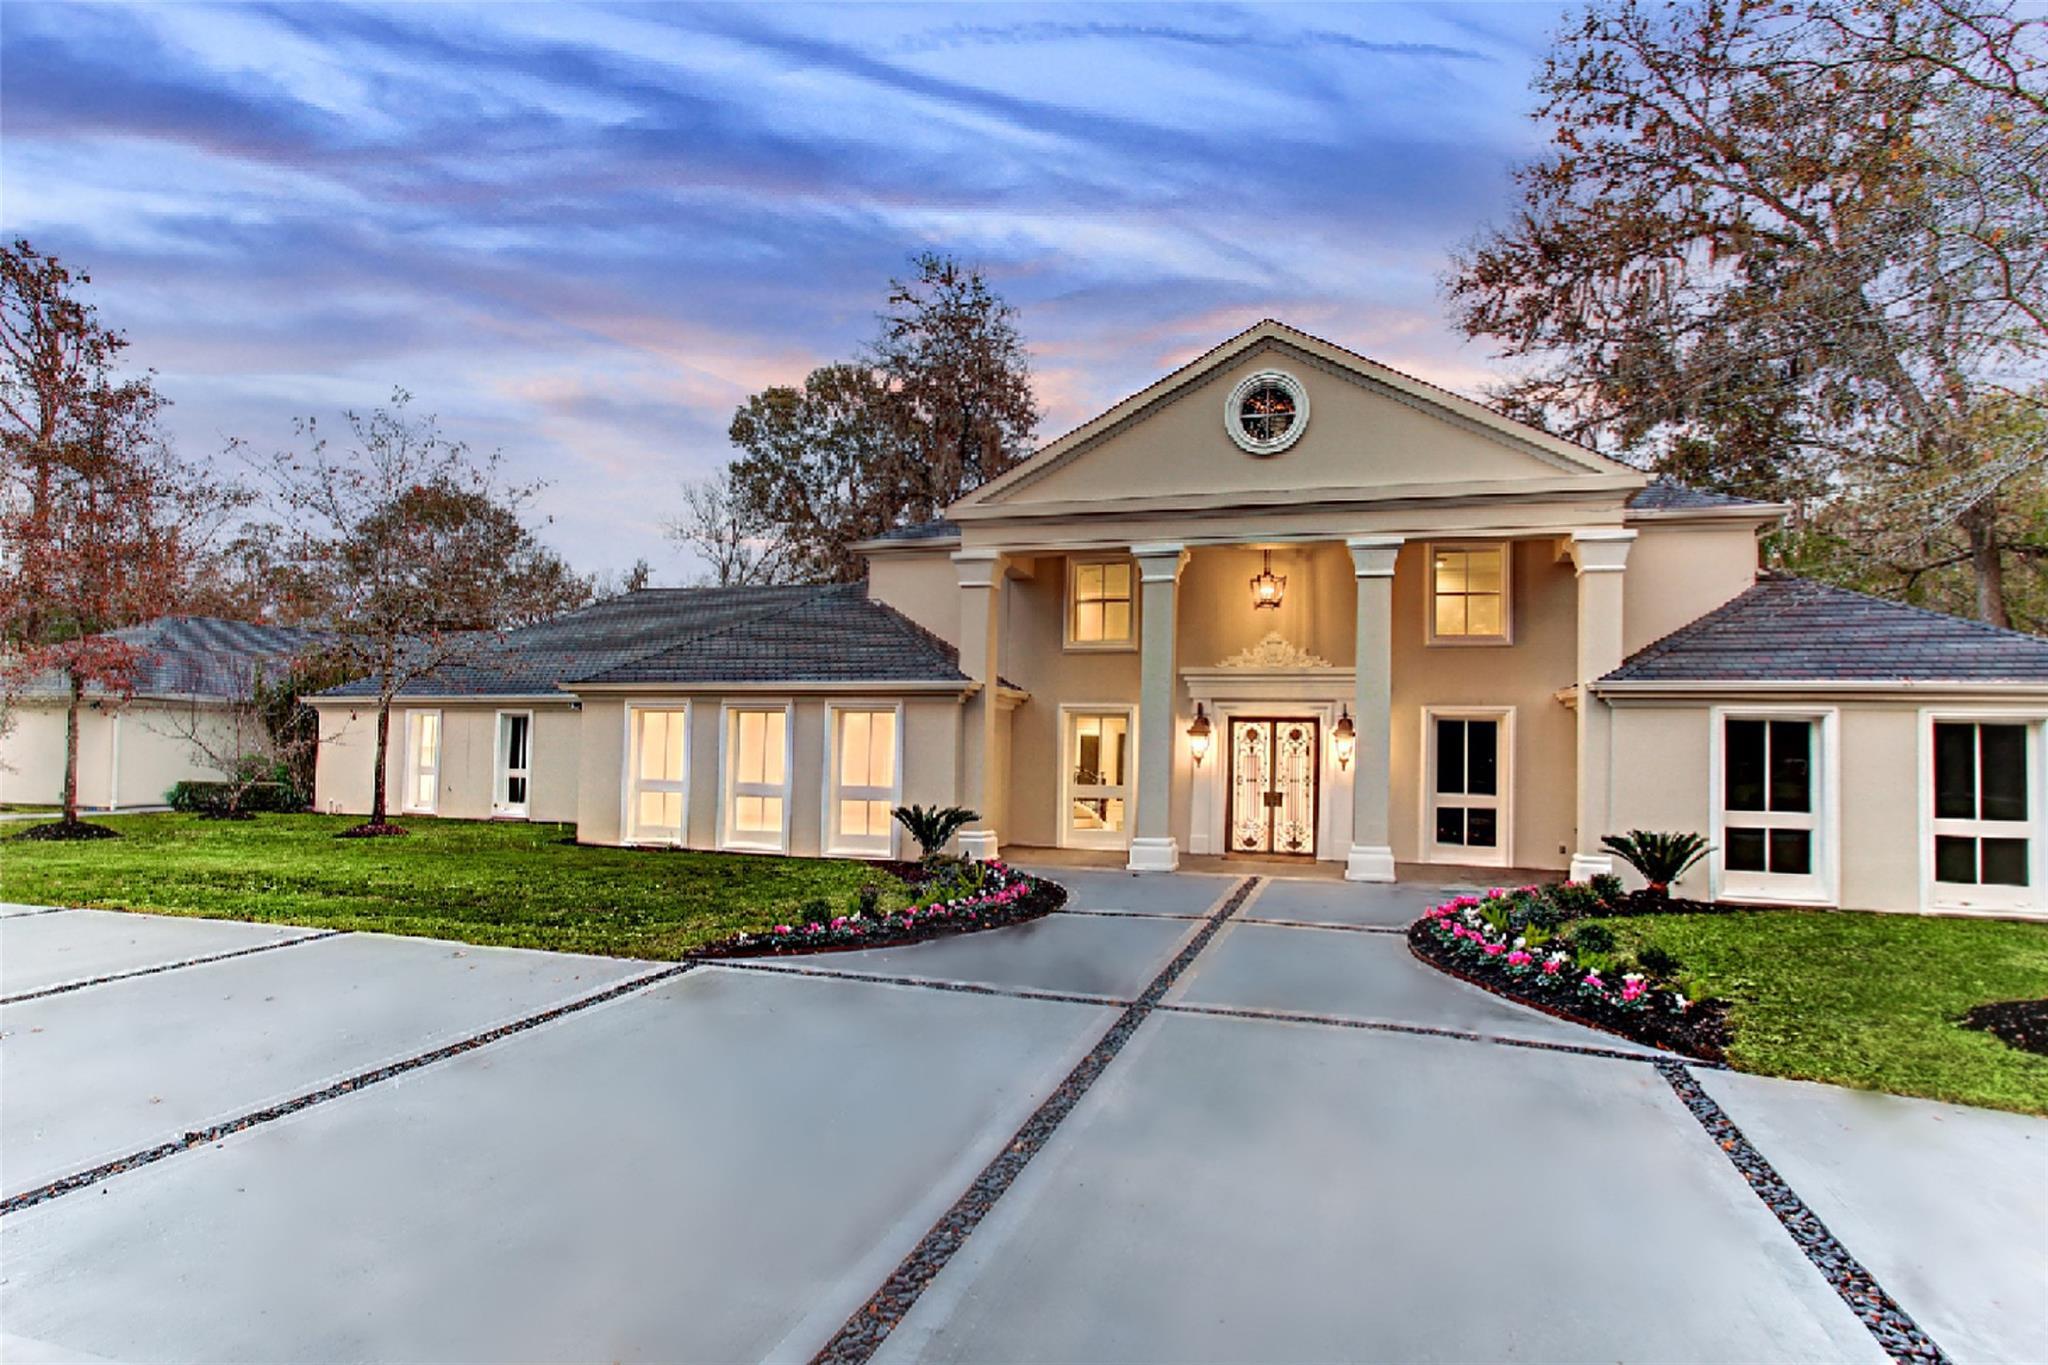 34 E Rivercrest Drive Property Photo - Houston, TX real estate listing